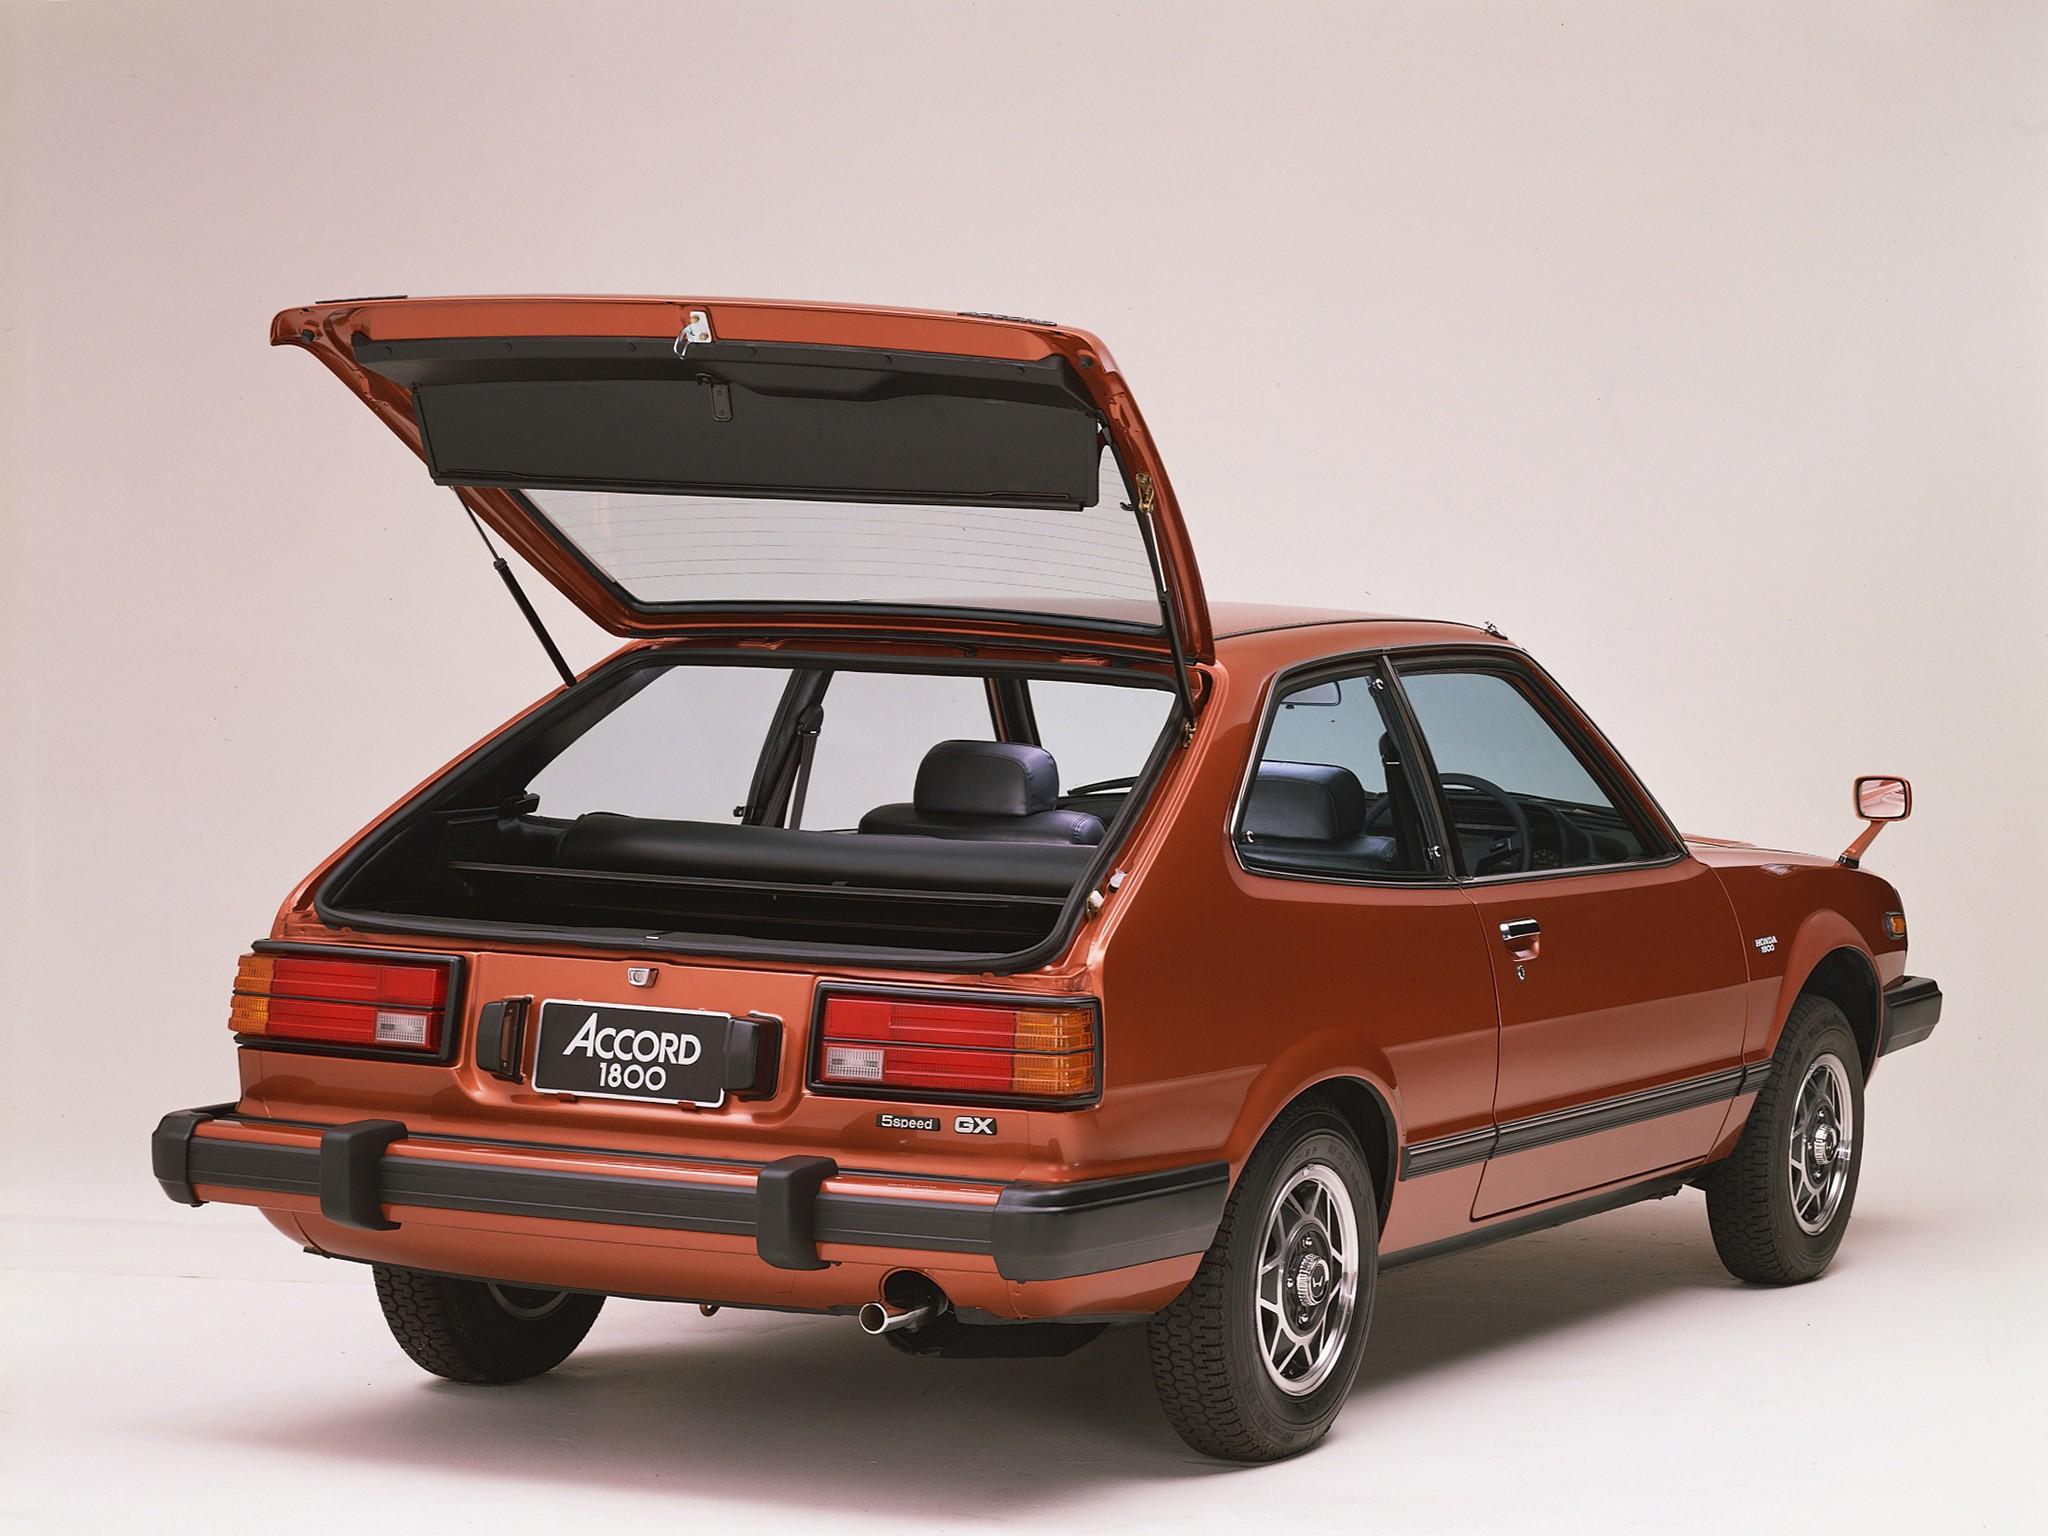 Honda Accord I 1976 - 1981 Hatchback 3 door #1